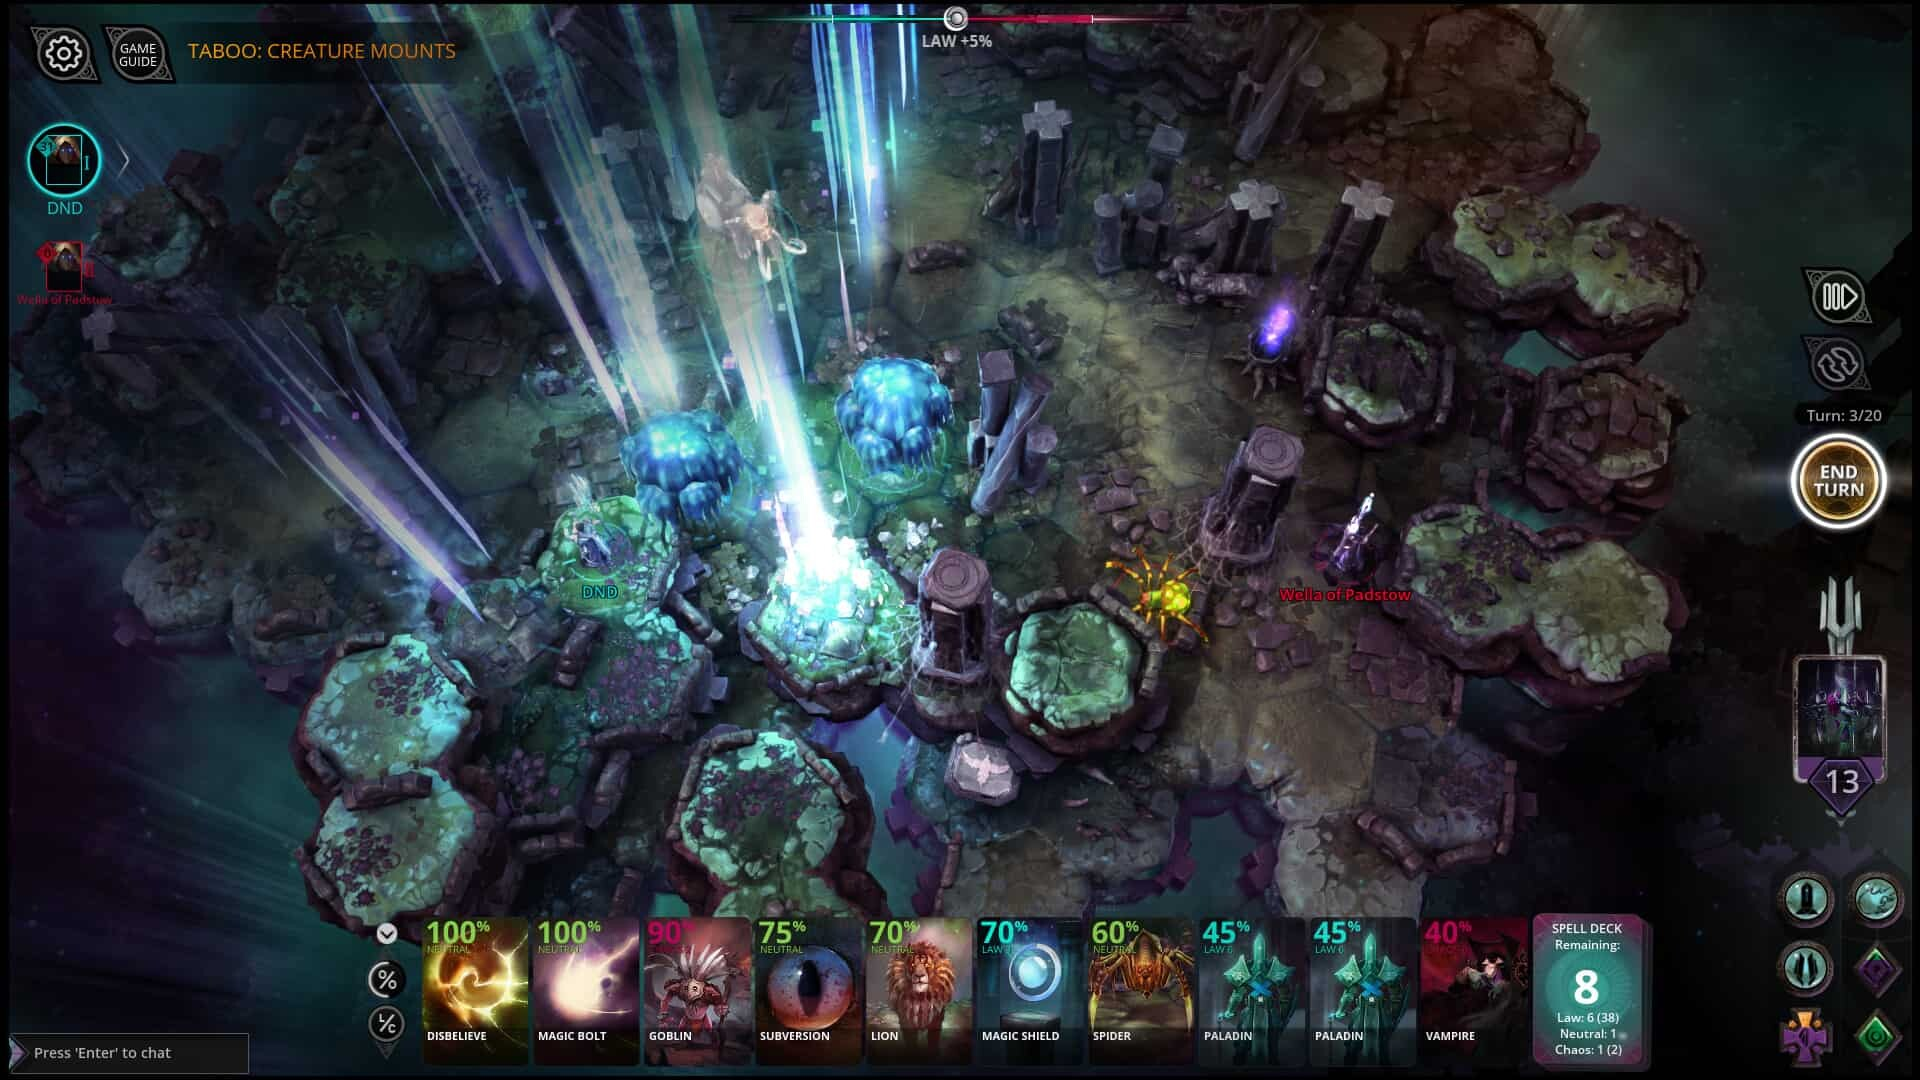 Chaos_Reborn-screenshot_1920x1080